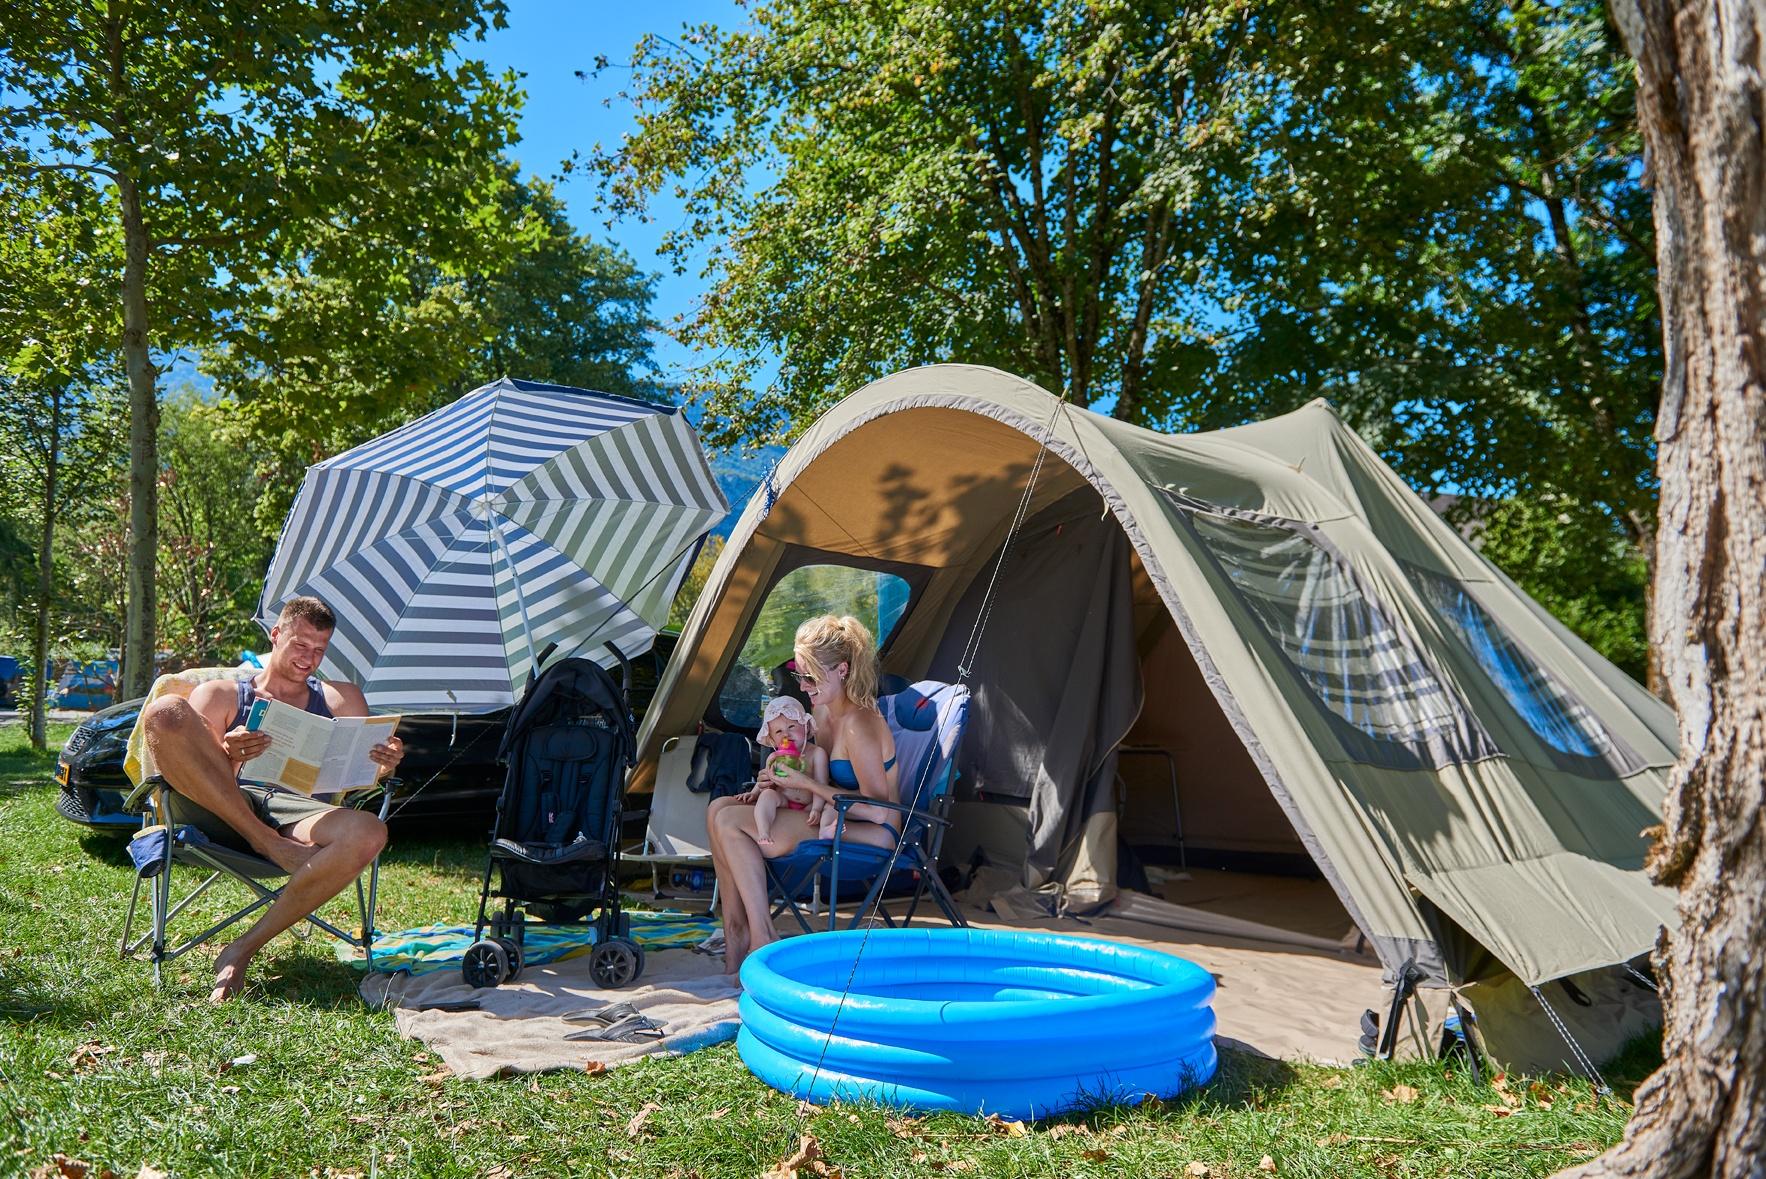 Frankrijk-Doussard-Campeole%20La%20Nubliere-ExtraLarge Campings Frankrijk